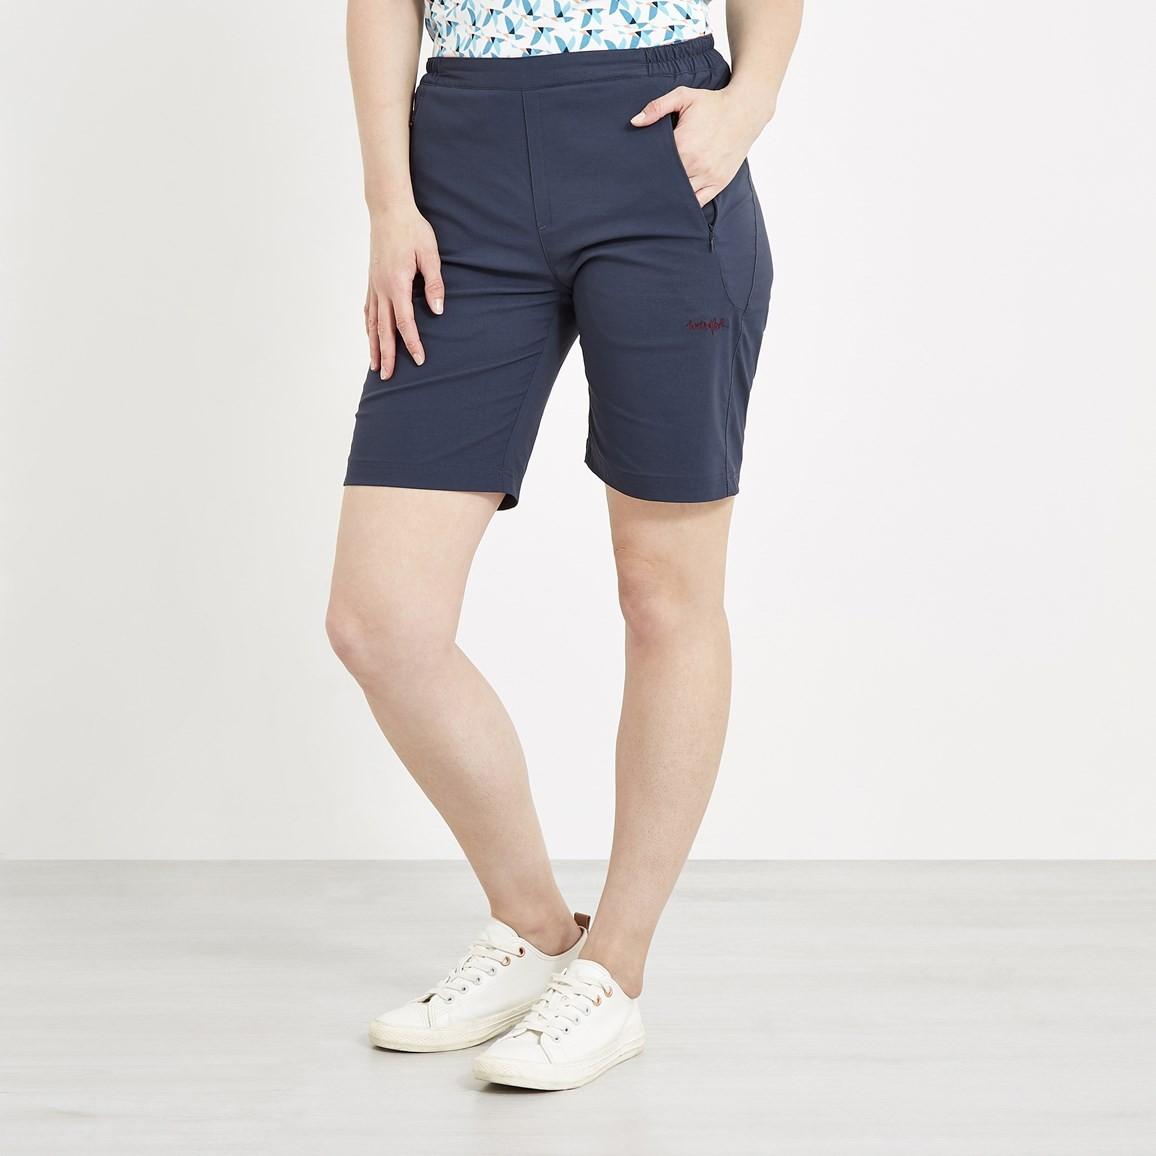 run shoes modern and elegant in fashion highly praised Harrima Quick Dry Walk Shorts Dark Navy